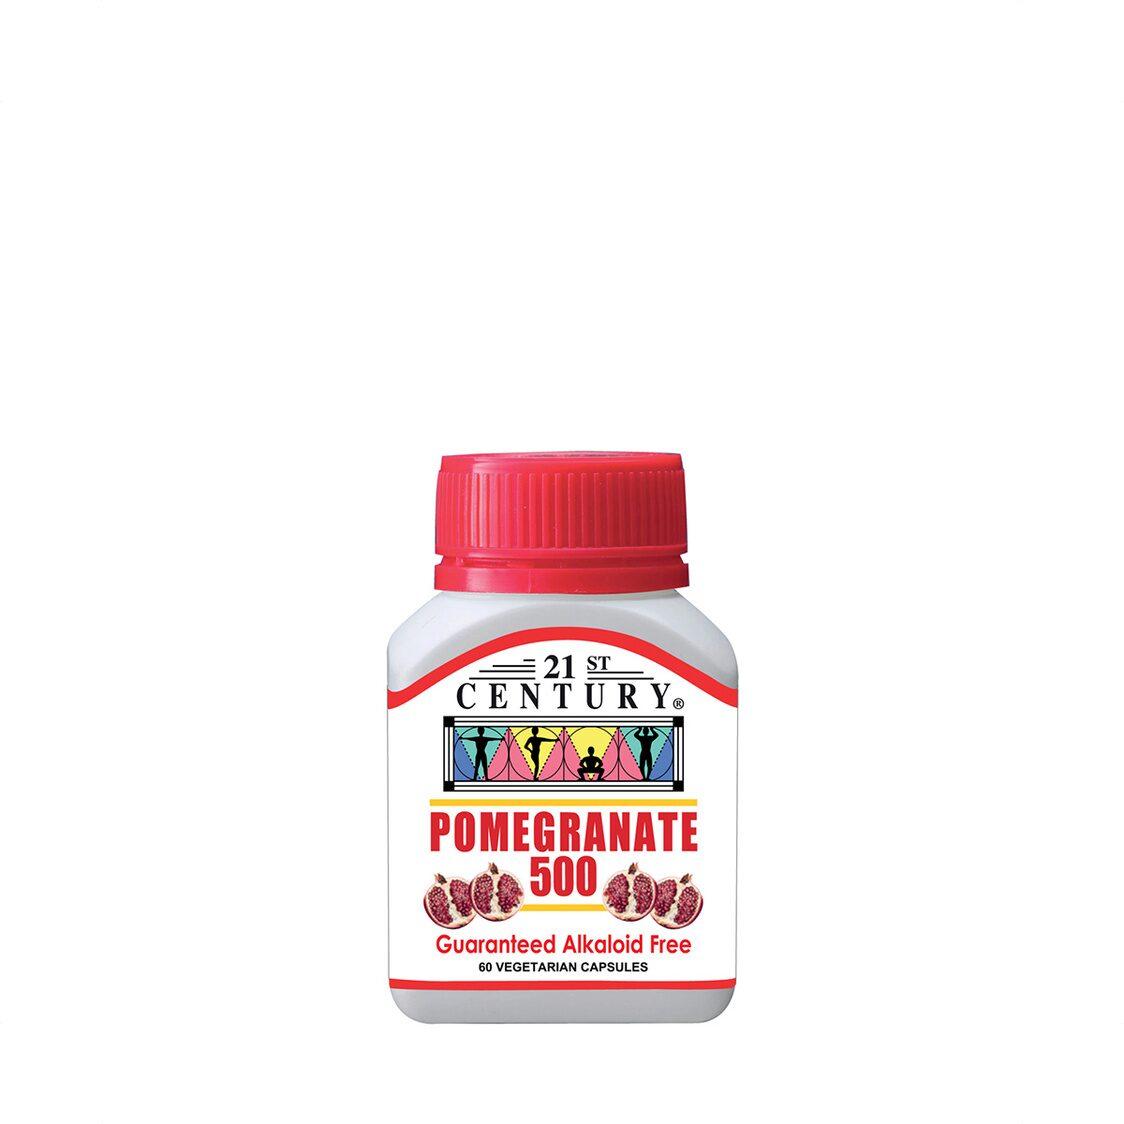 Pomegranate 500 60s